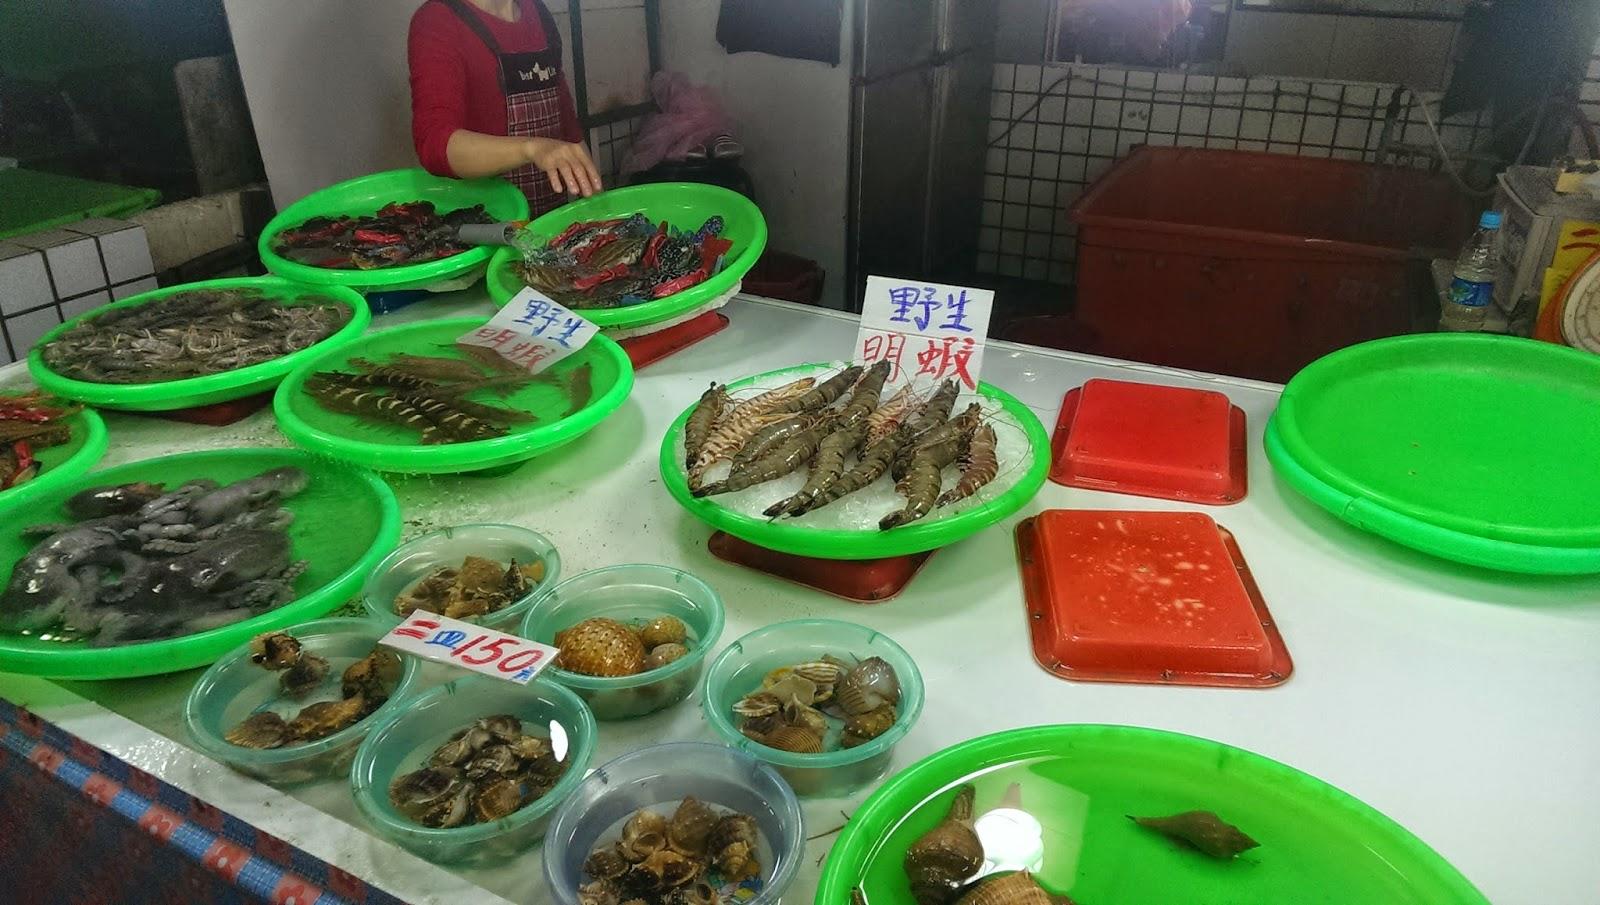 2015 02 02%2B12.54.29 - [食記] 葉家生魚片 - 布袋觀光漁市中的鮮魚餐廳